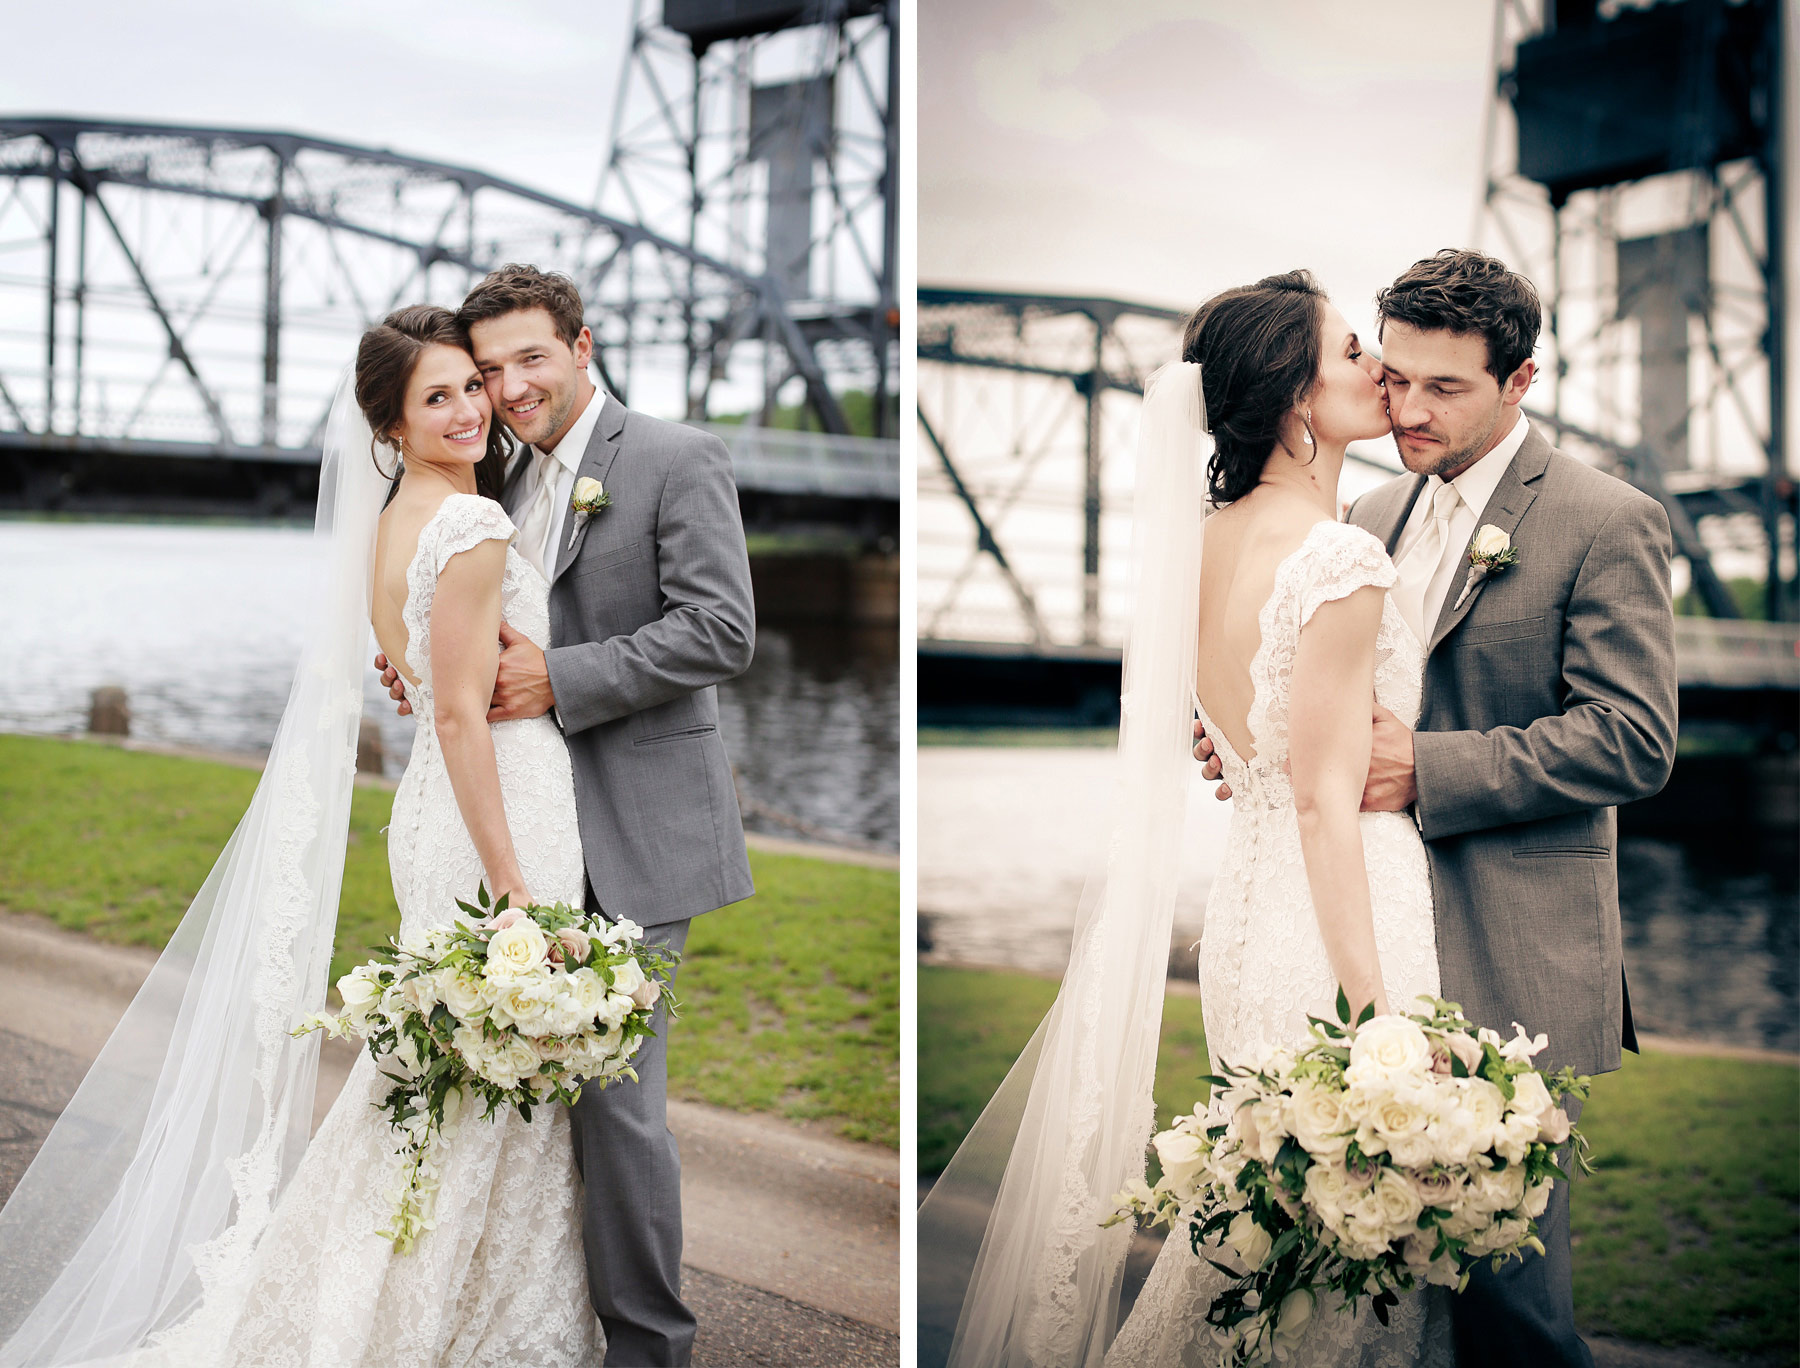 13-Stillwater-Minnesota-Wedding-Photography-by-Vick-Photography--Alicia-&-Cole.jpg